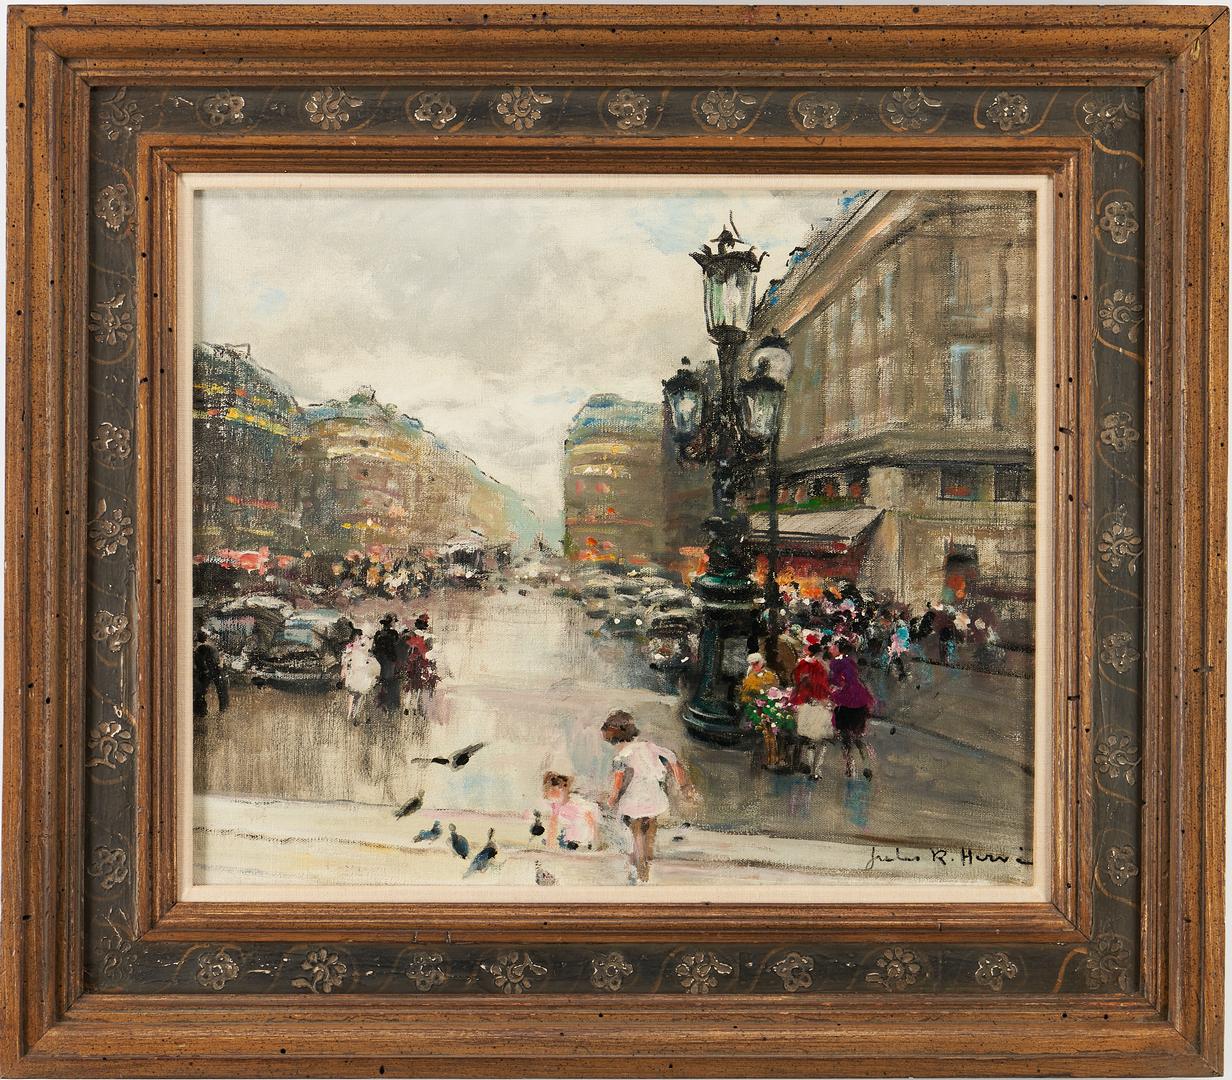 Lot 142: Jules Rene Herve O/C Painting, Parisian Street Scene